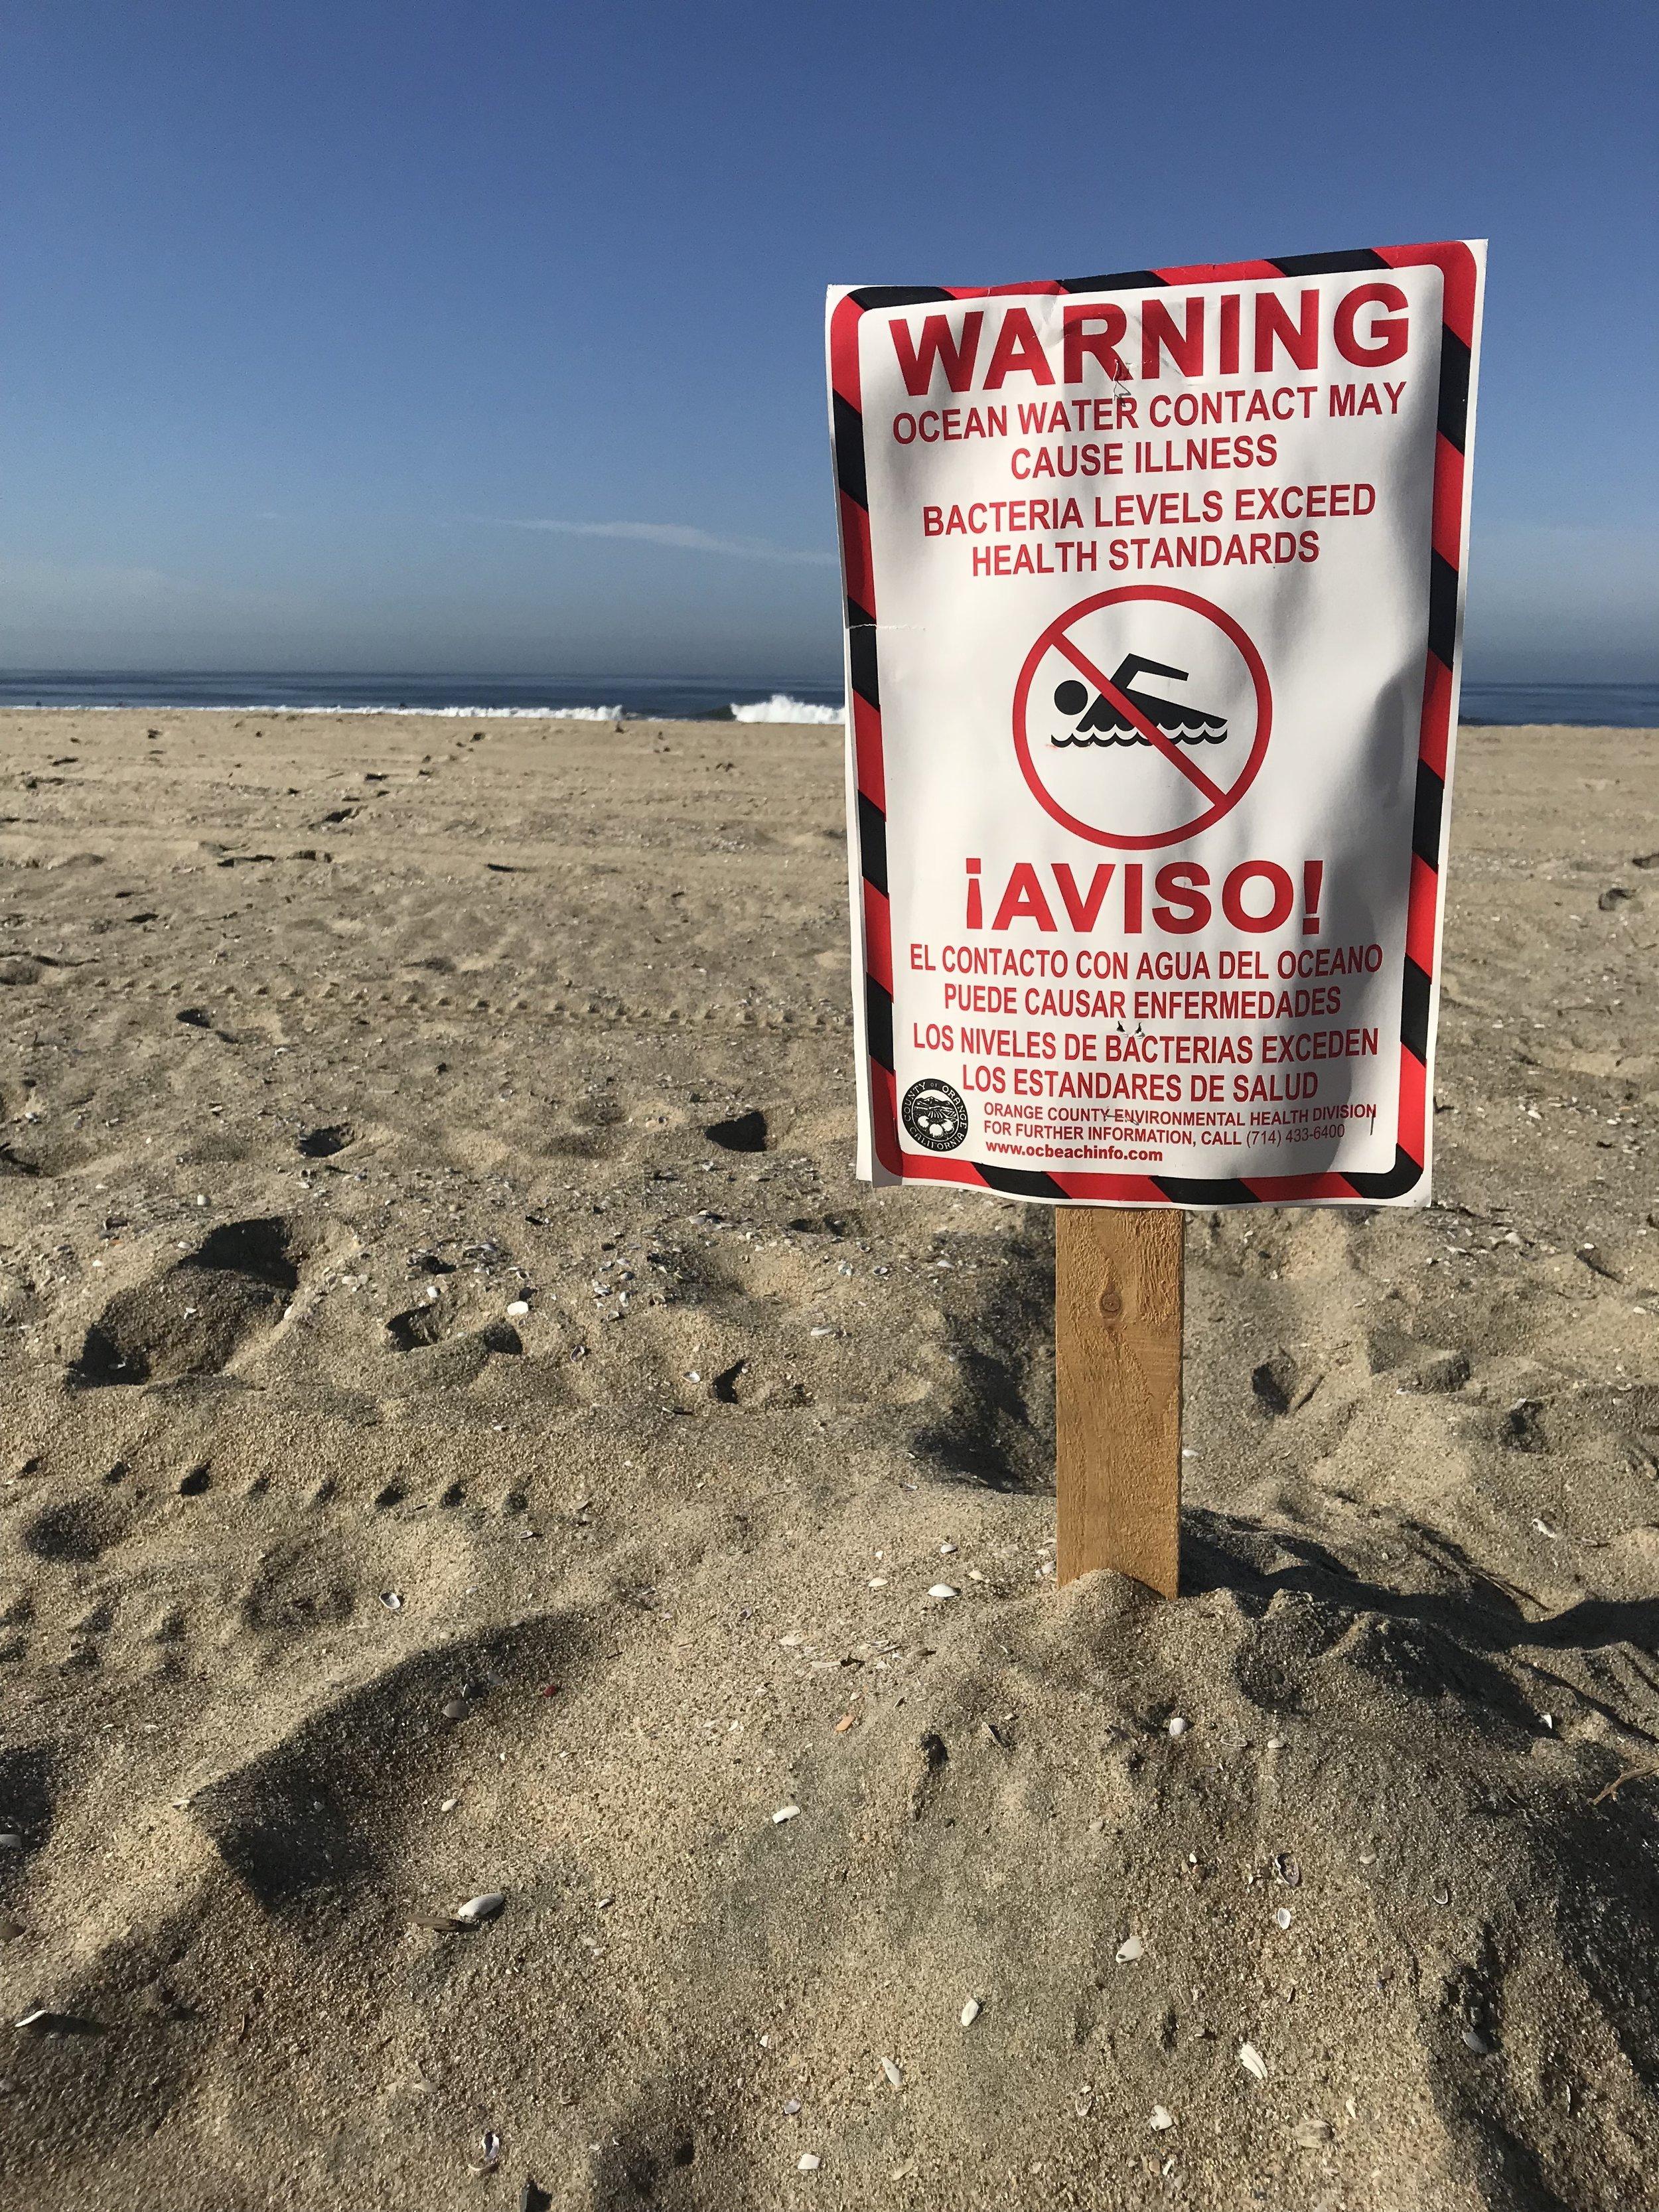 April 21st Huntington Beach, CA -Water Quality Warning